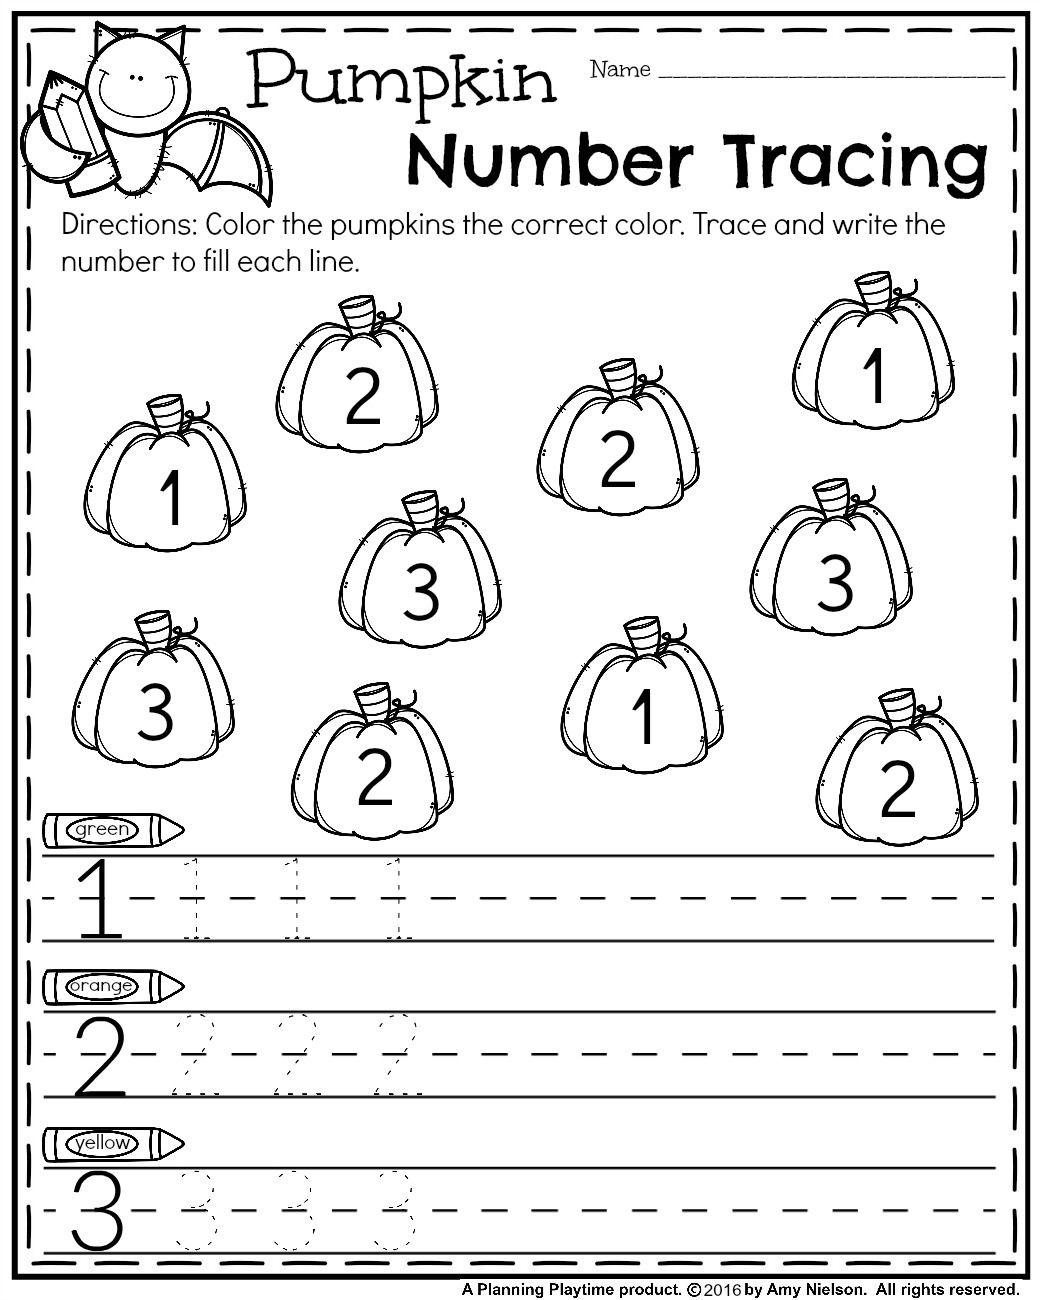 October Preschool Worksheets   Number tracing, Worksheets and Number